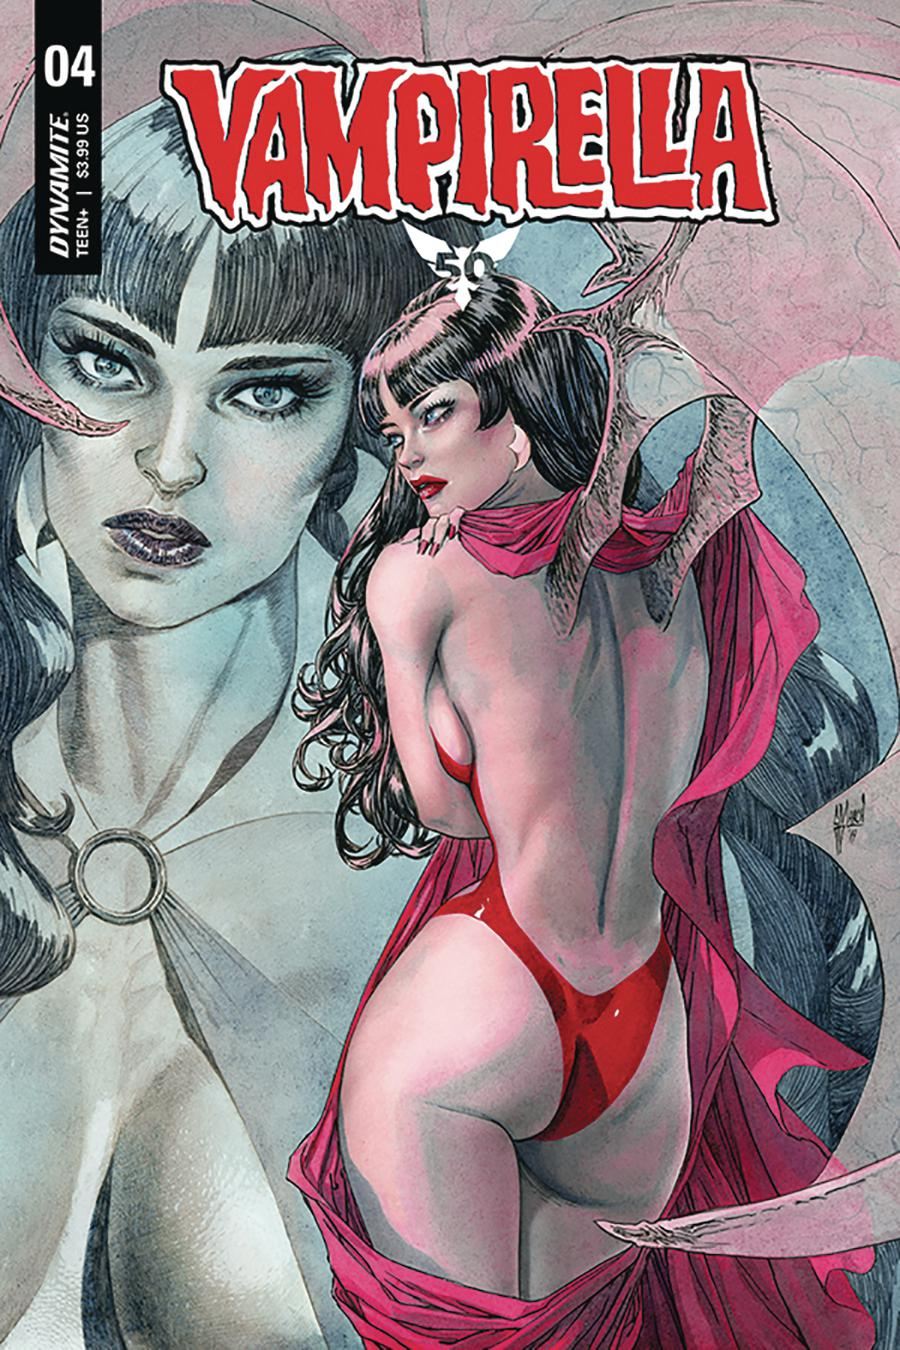 Vampirella Vol 8 #4 Cover B Variant Guillem March Cover